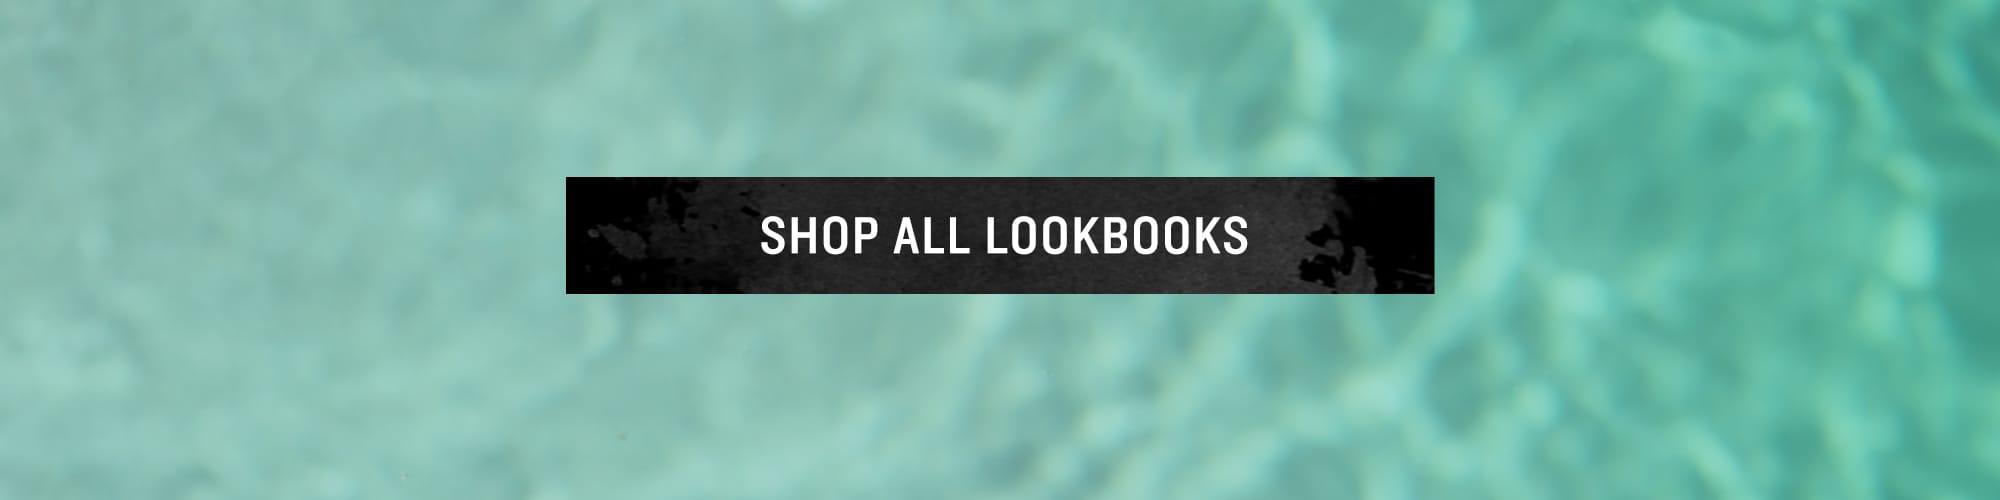 Shop All Lookbooks